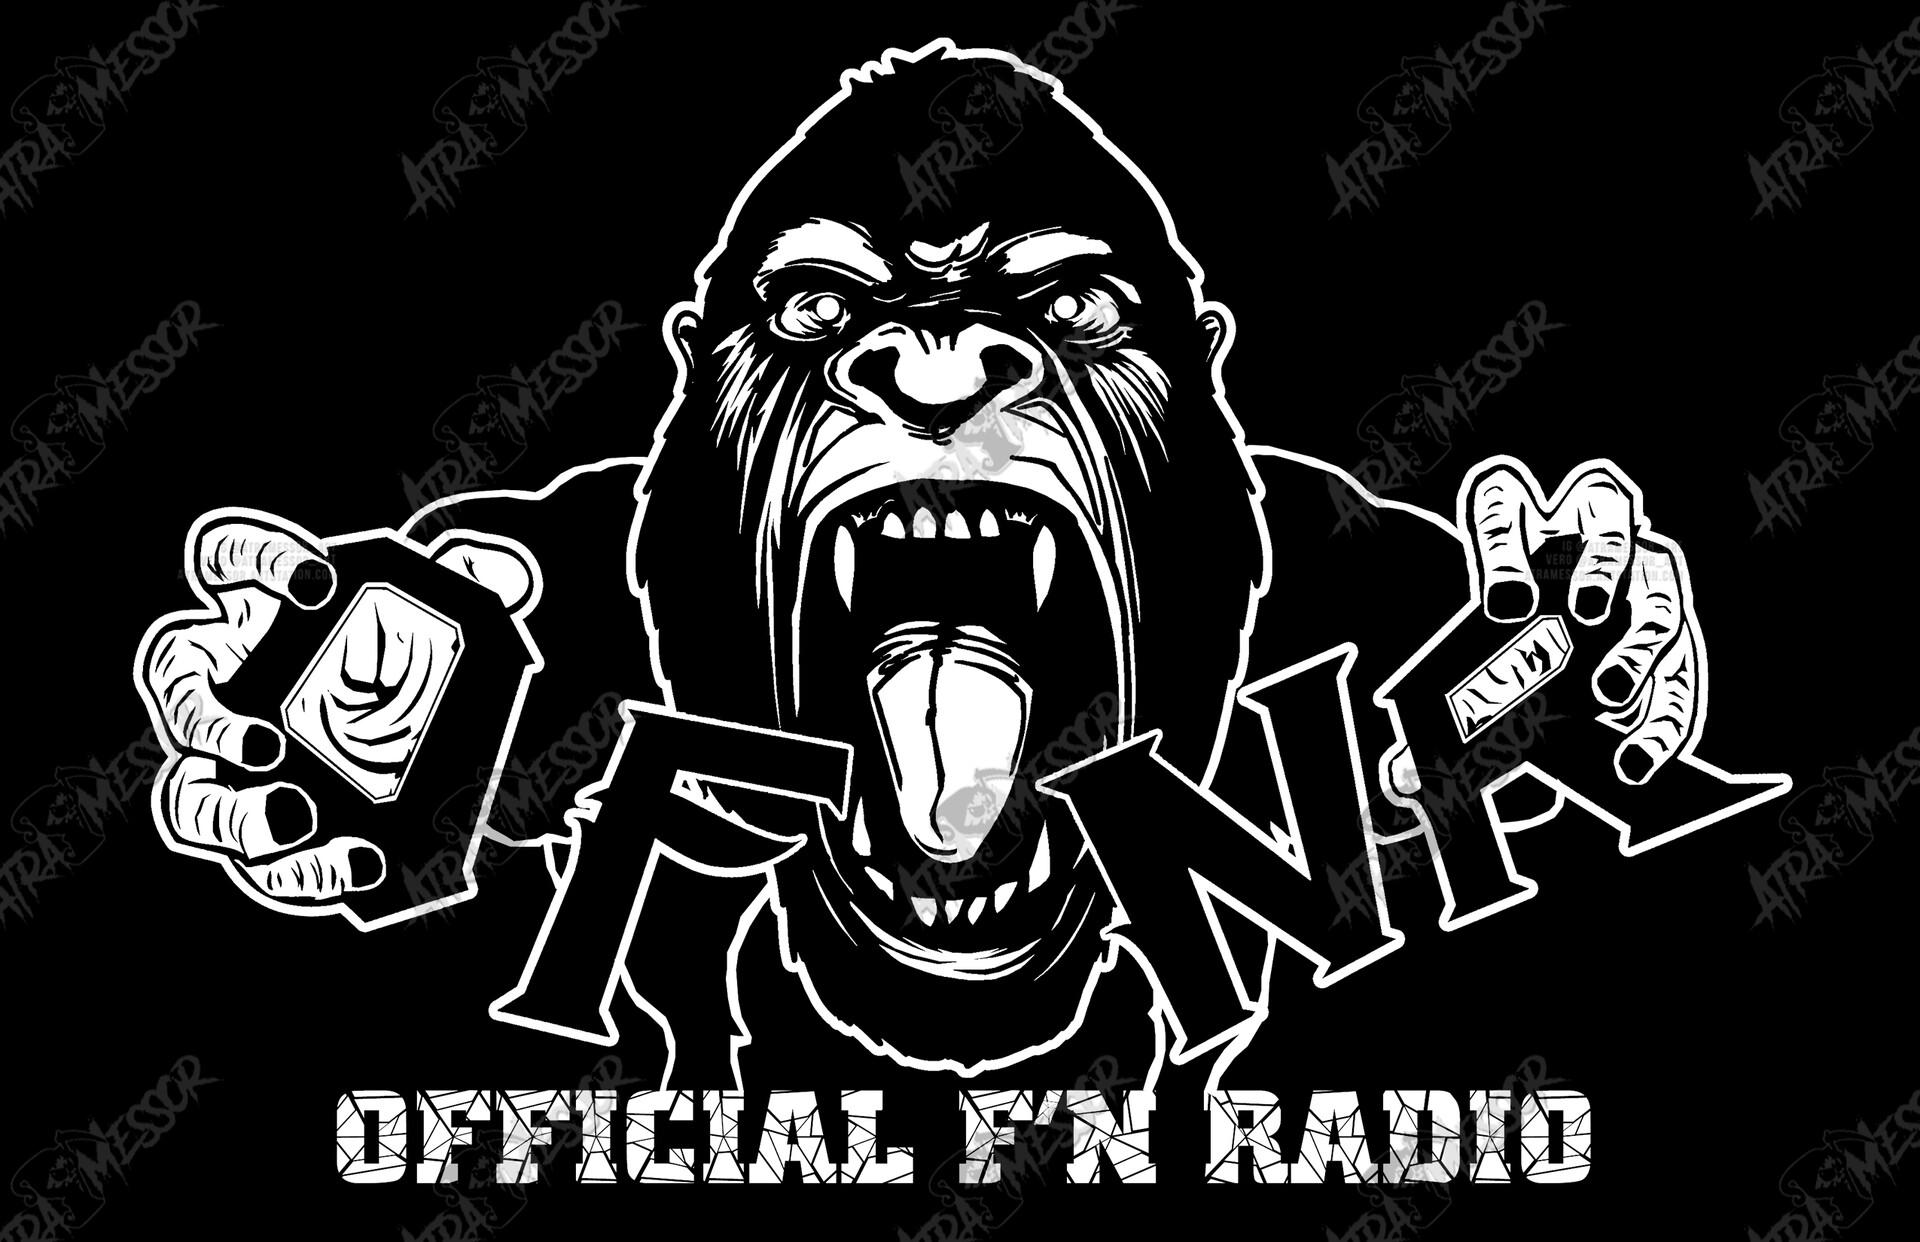 OFNR Gorilla merch for Official F'N Radio